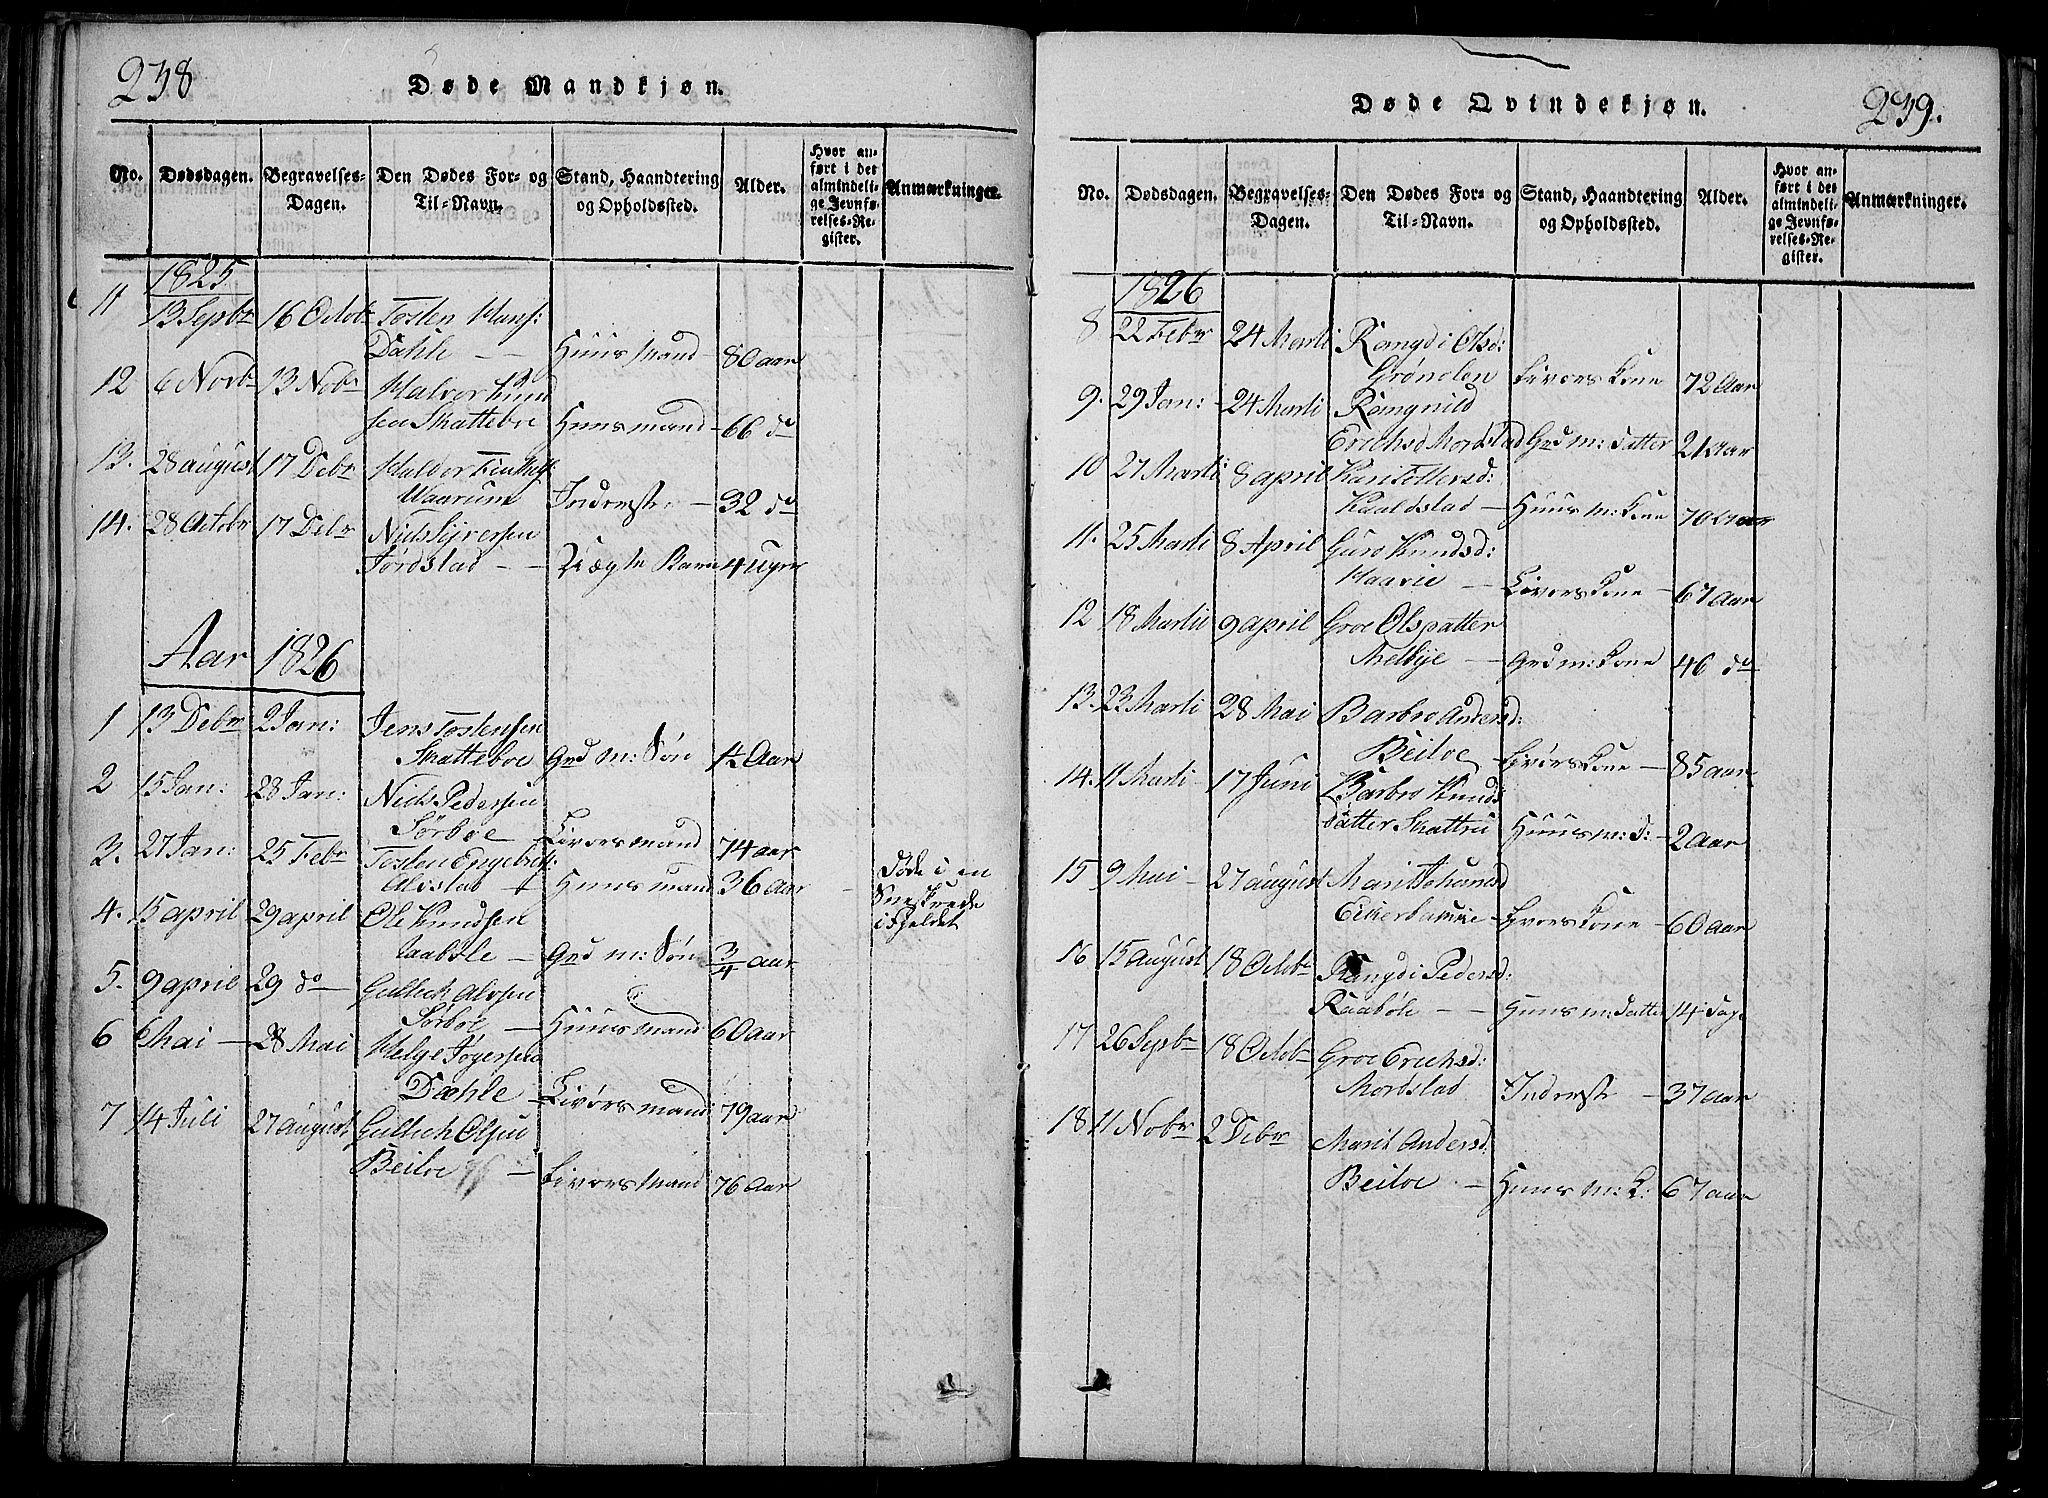 SAH, Slidre prestekontor, Klokkerbok nr. 2, 1814-1839, s. 238-239